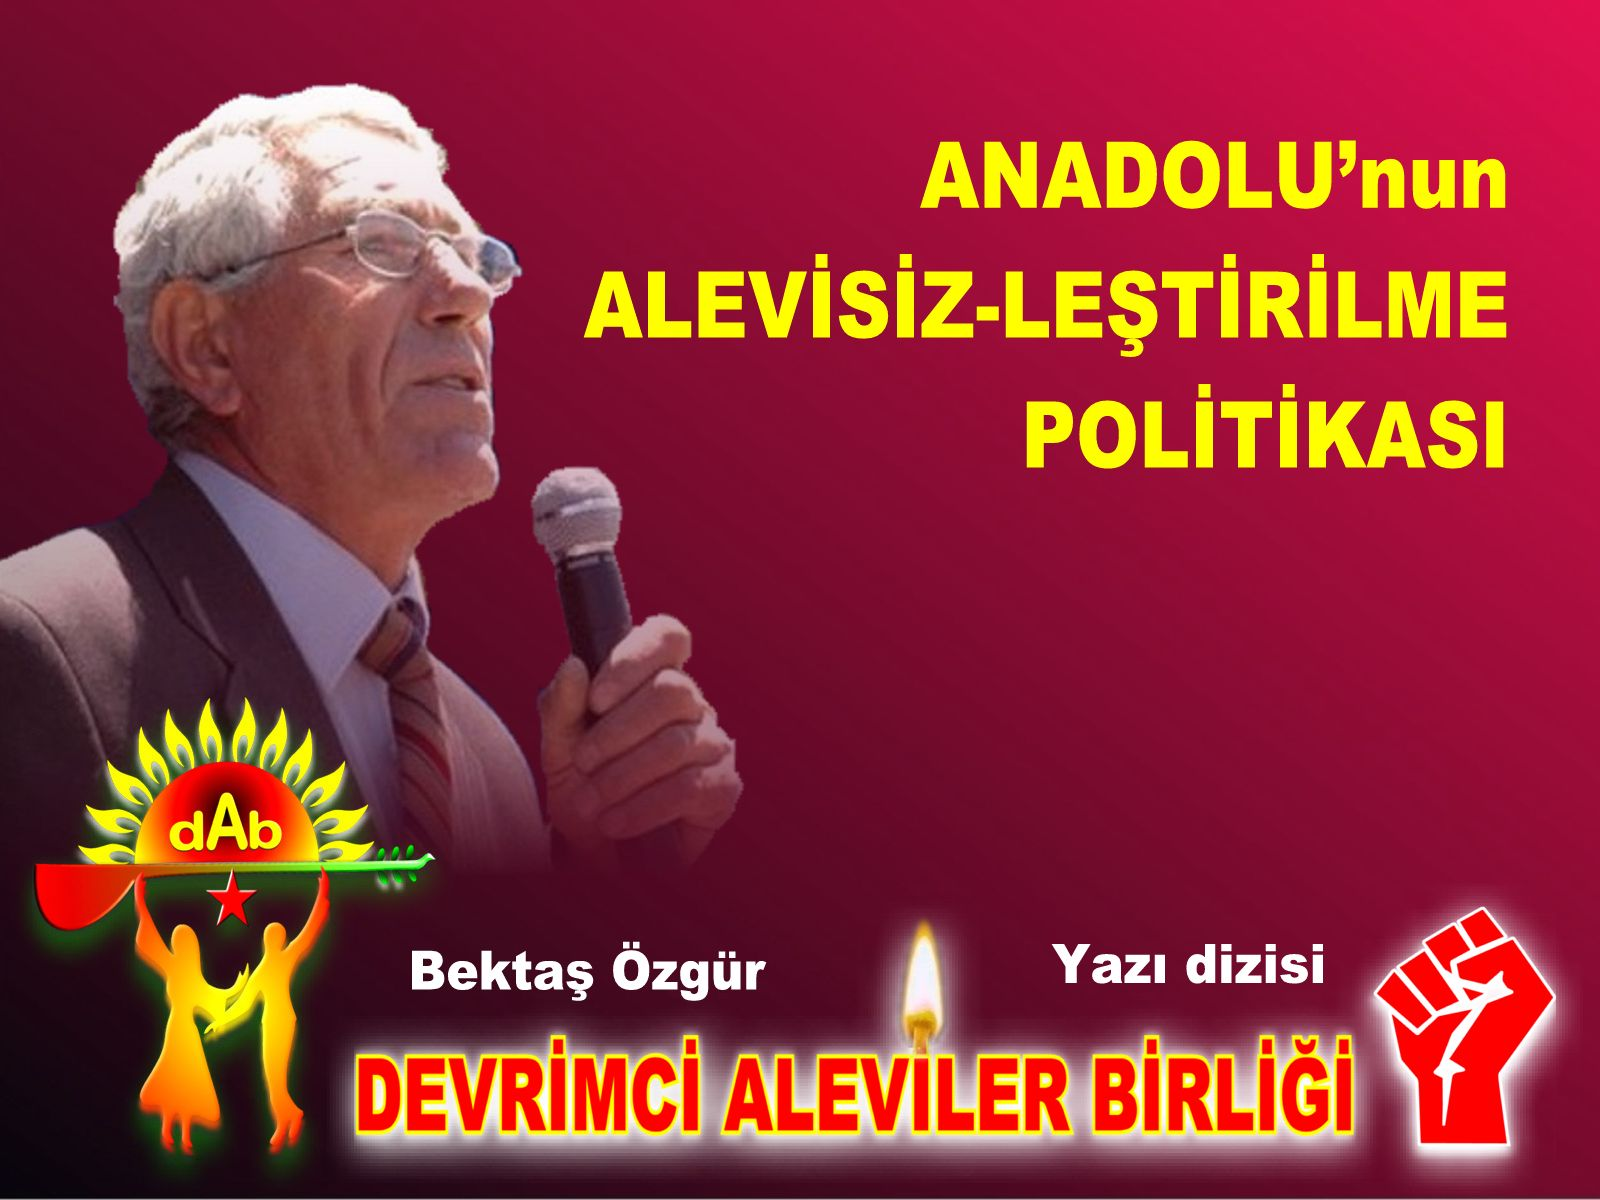 DAB devrimci Aleviler birligi Anadolunun Alevisisletirme politikasi